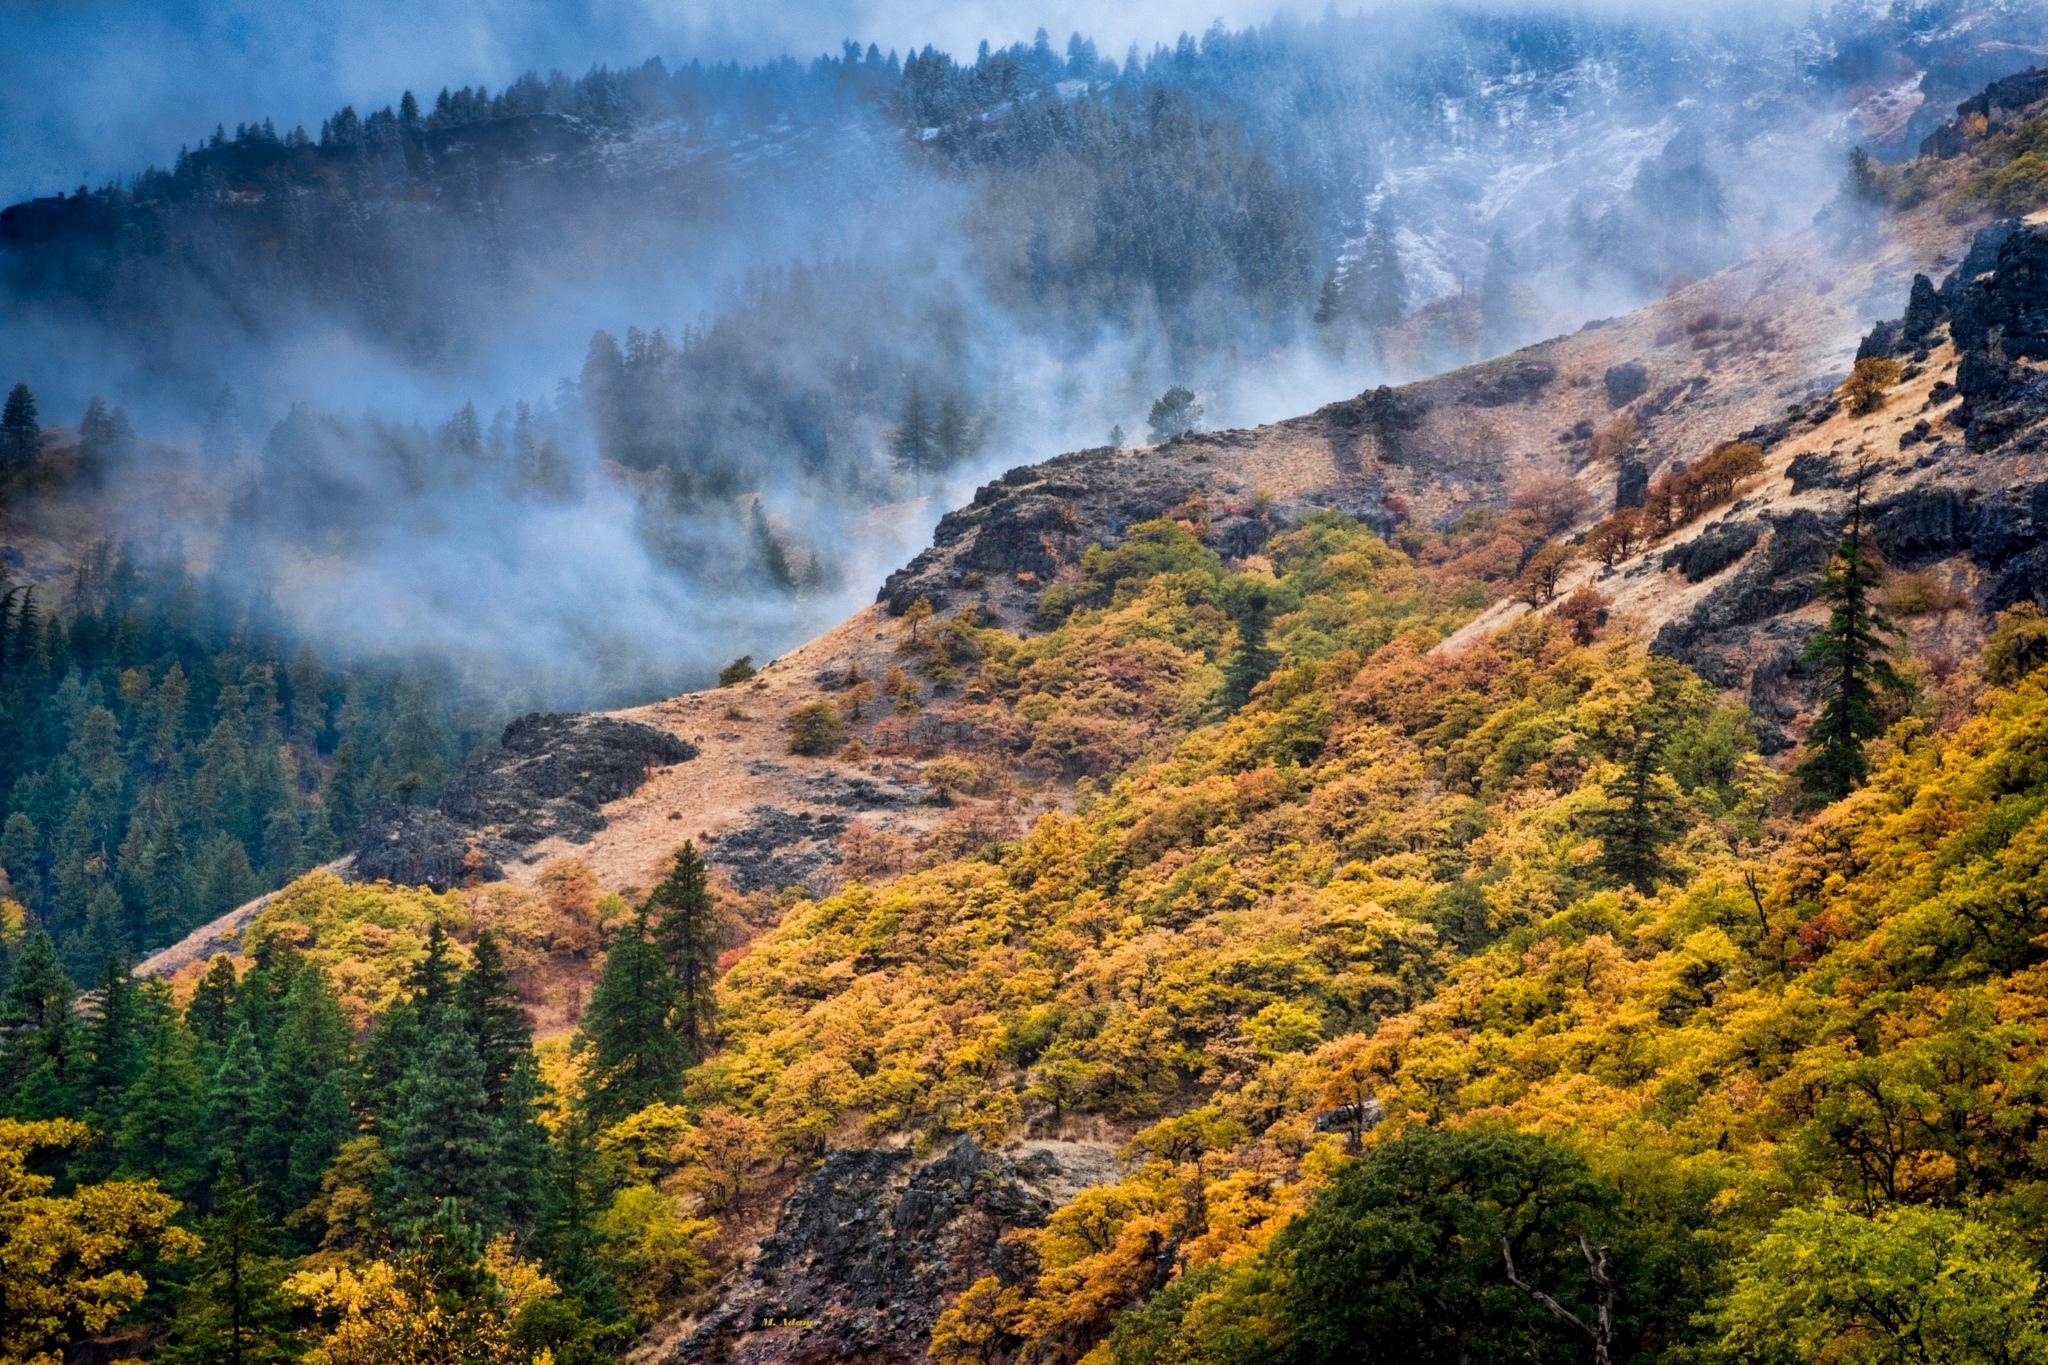 Misty Mountain by Mike Adams